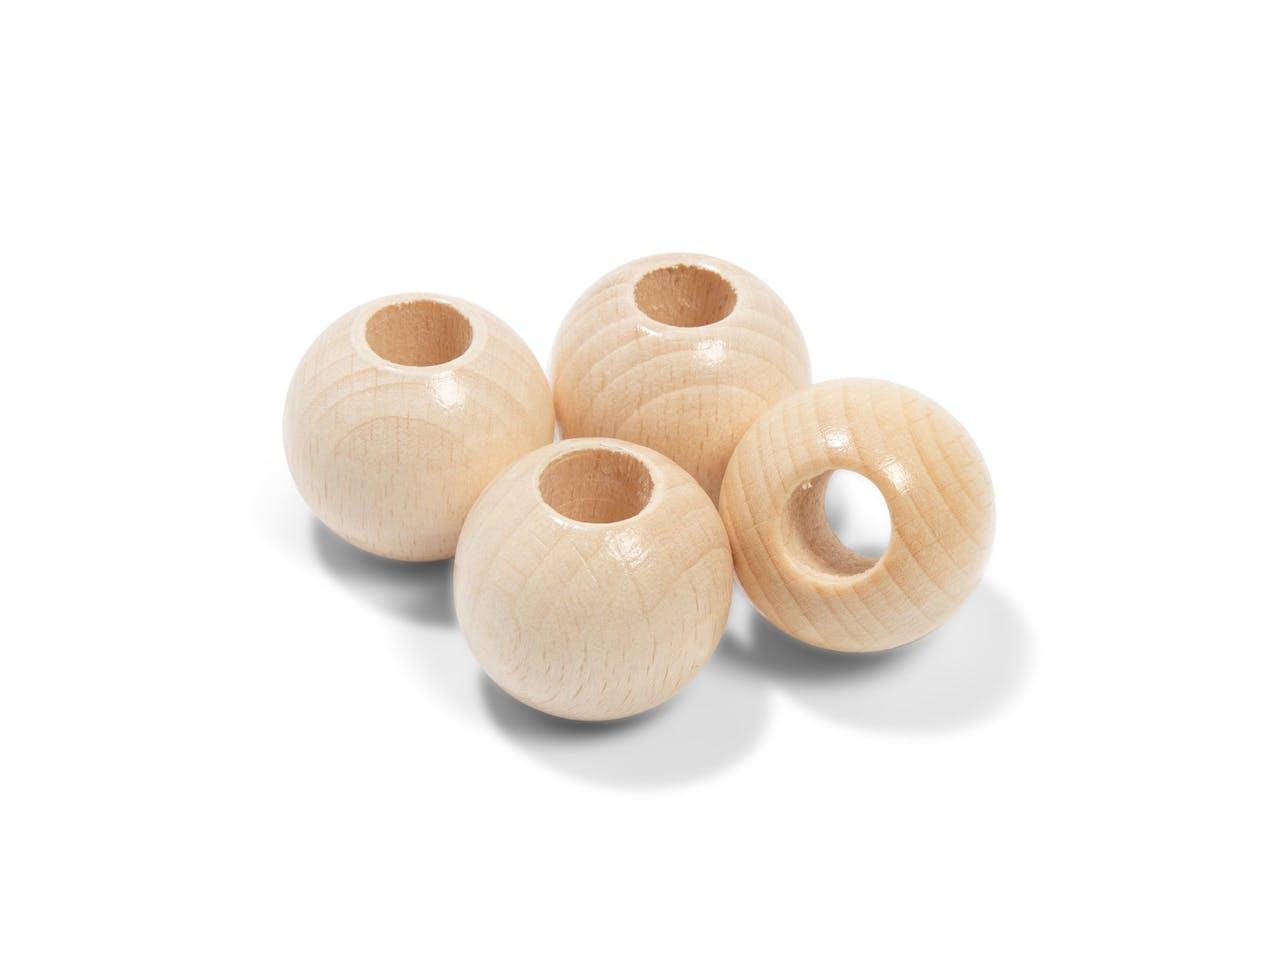 Holzperlen Buche Set, ø 25,0 x 10,0 mm, rund, 4 Stück, natur